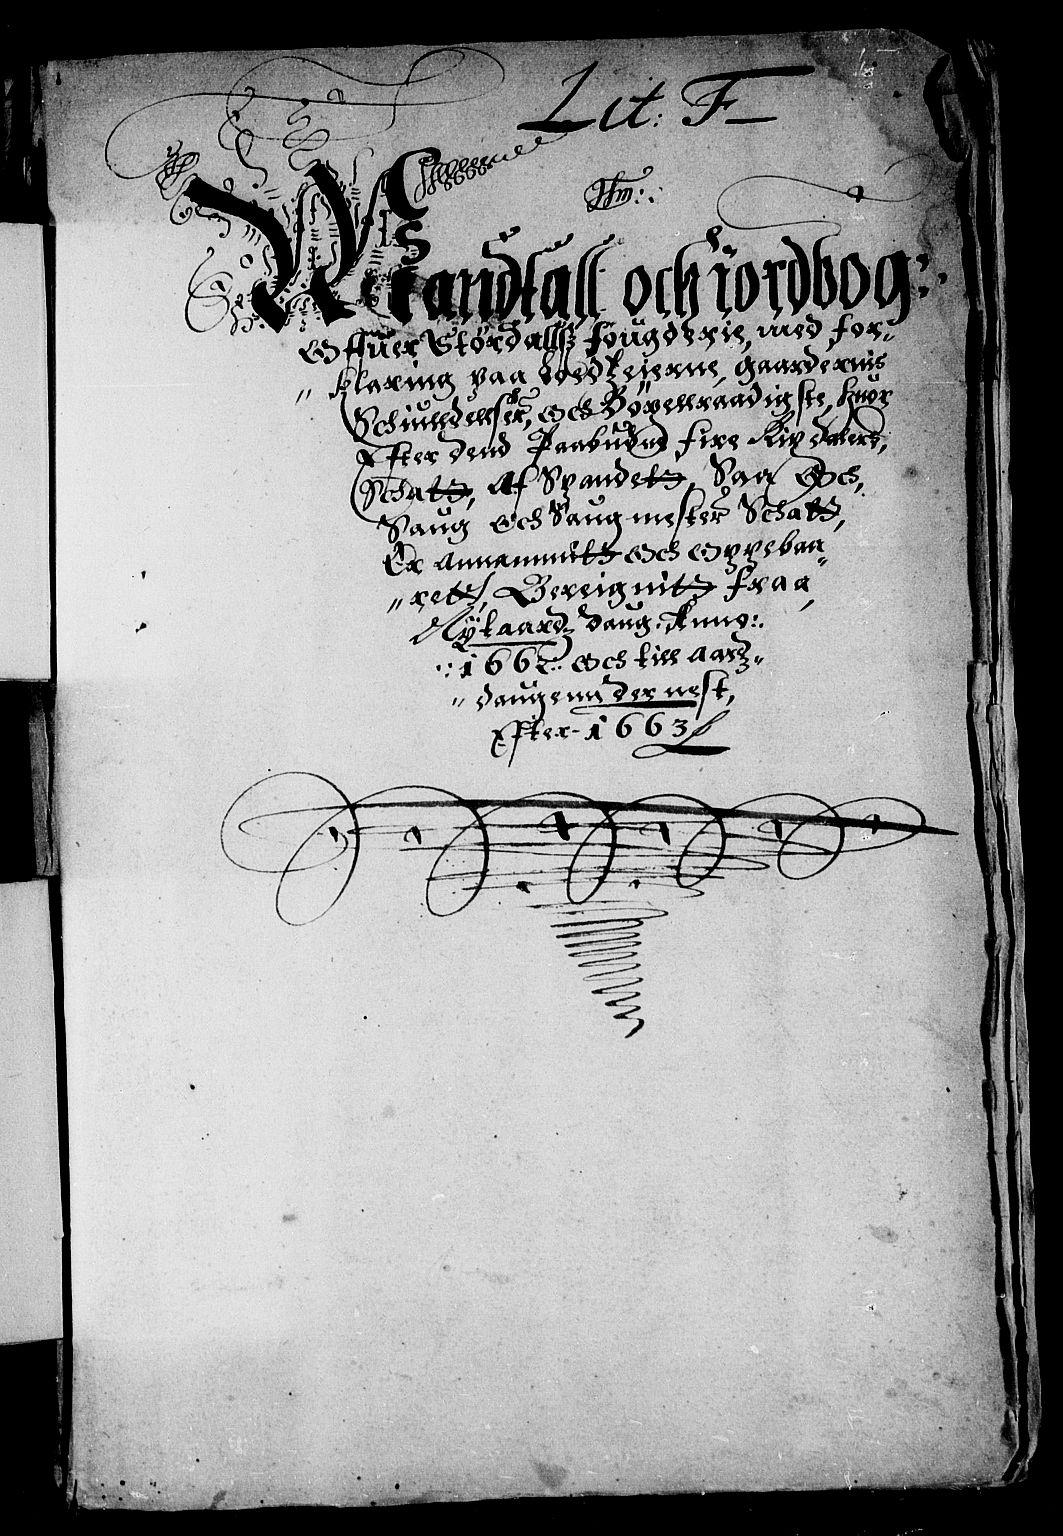 RA, Rentekammeret inntil 1814, Reviderte regnskaper, Stiftamtstueregnskaper, Trondheim stiftamt og Nordland amt, R/Rd/L0002: Trondheim stiftamt, 1662